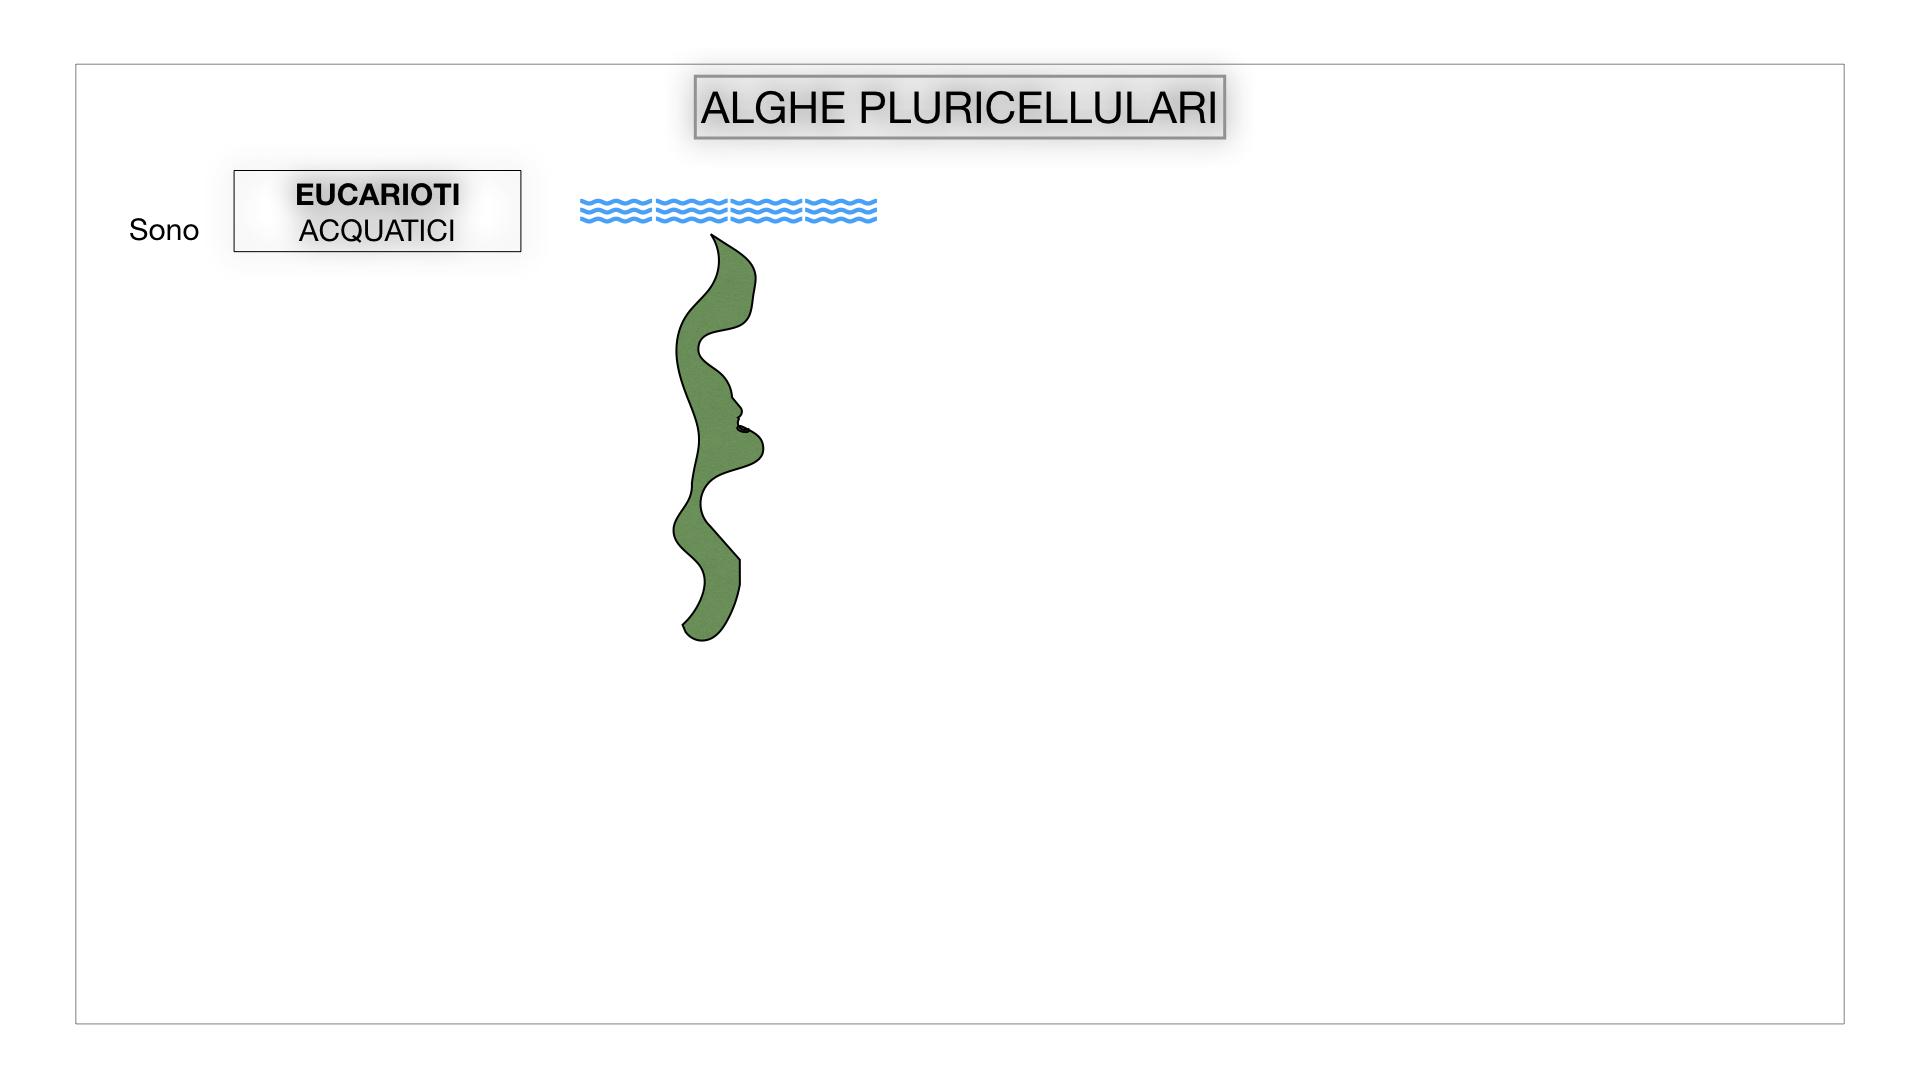 8. alghe uni_pluri_cellulari_SIMULAZIONE.024